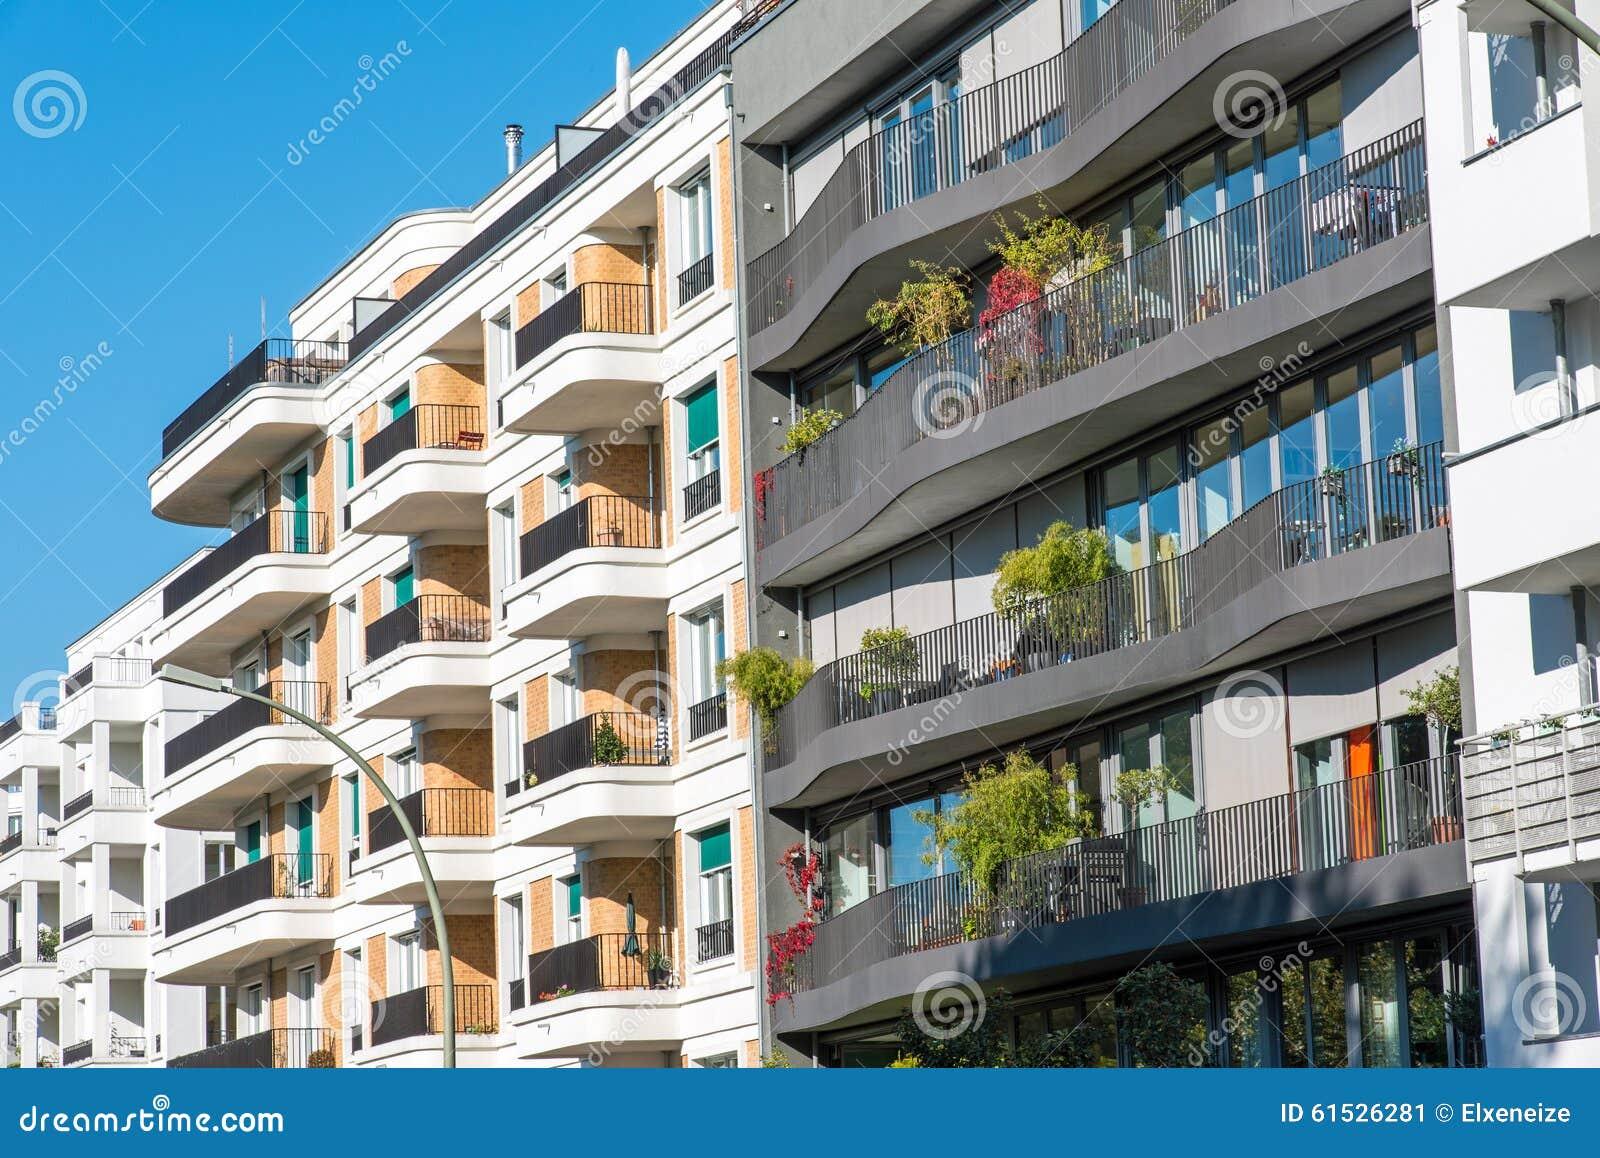 Le facciate di alcune case moderne immagine stock for Immagini facciate case